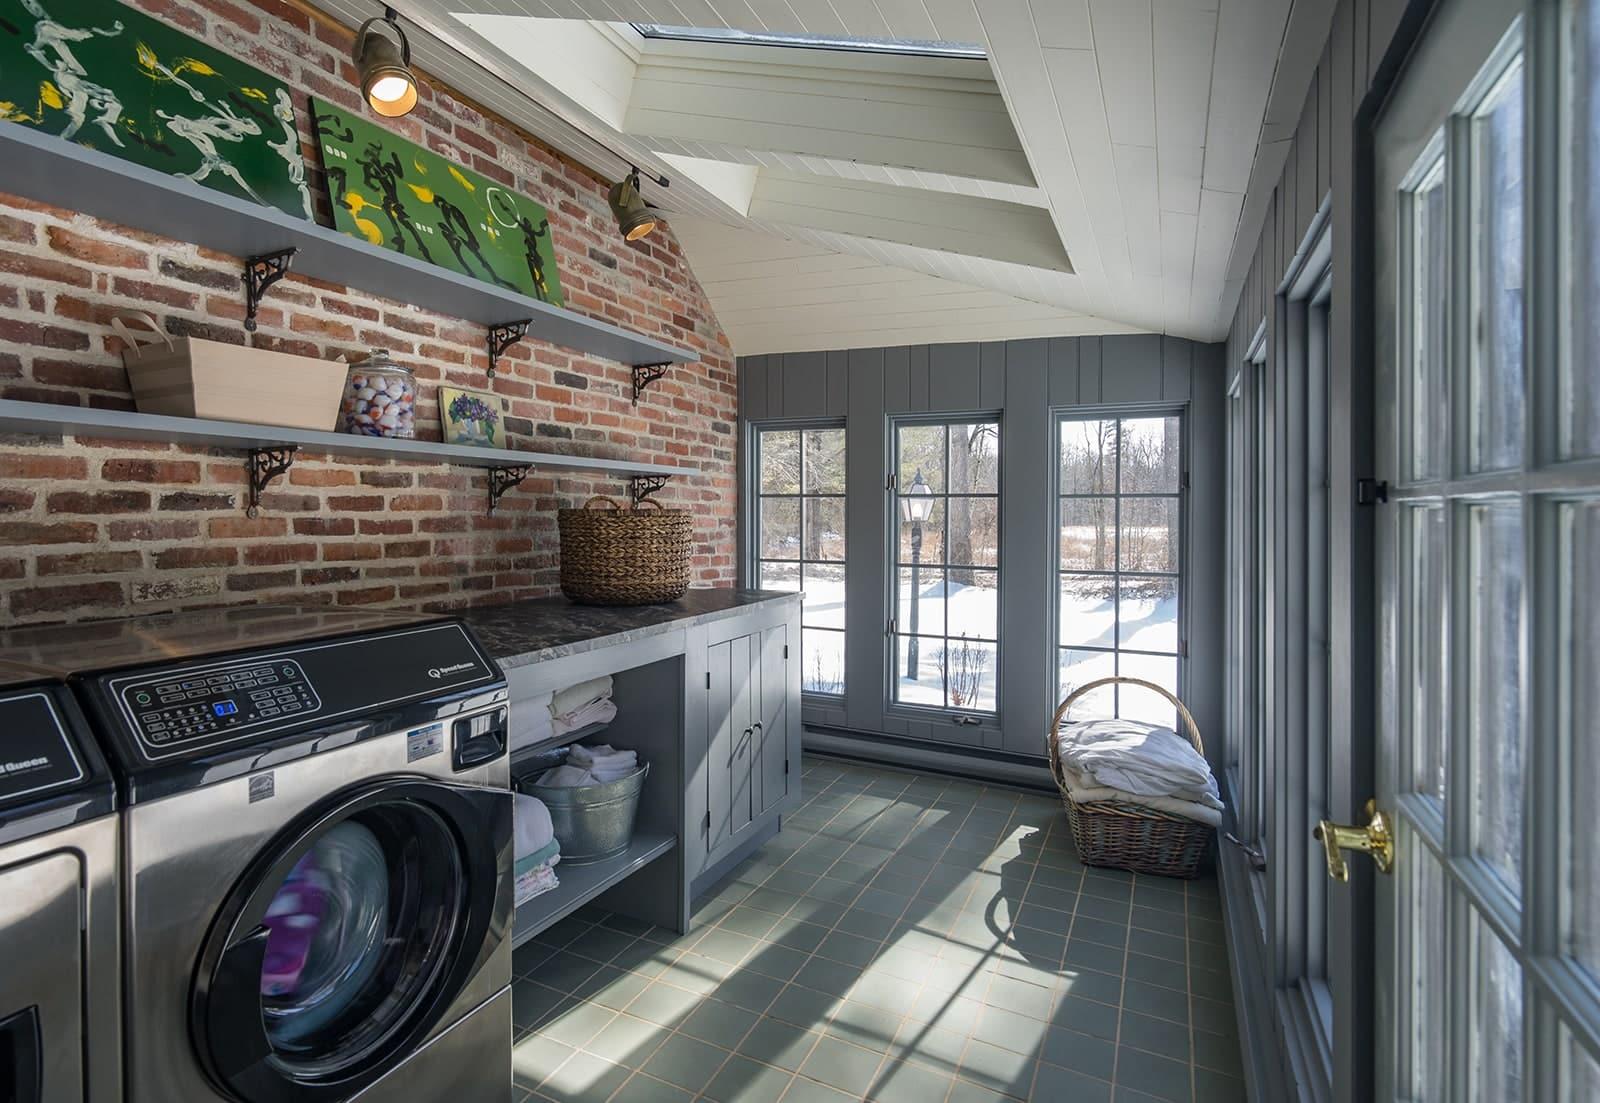 New Hampshire Homestead Historic New Hampshire Homestead Historic Interior Laundry